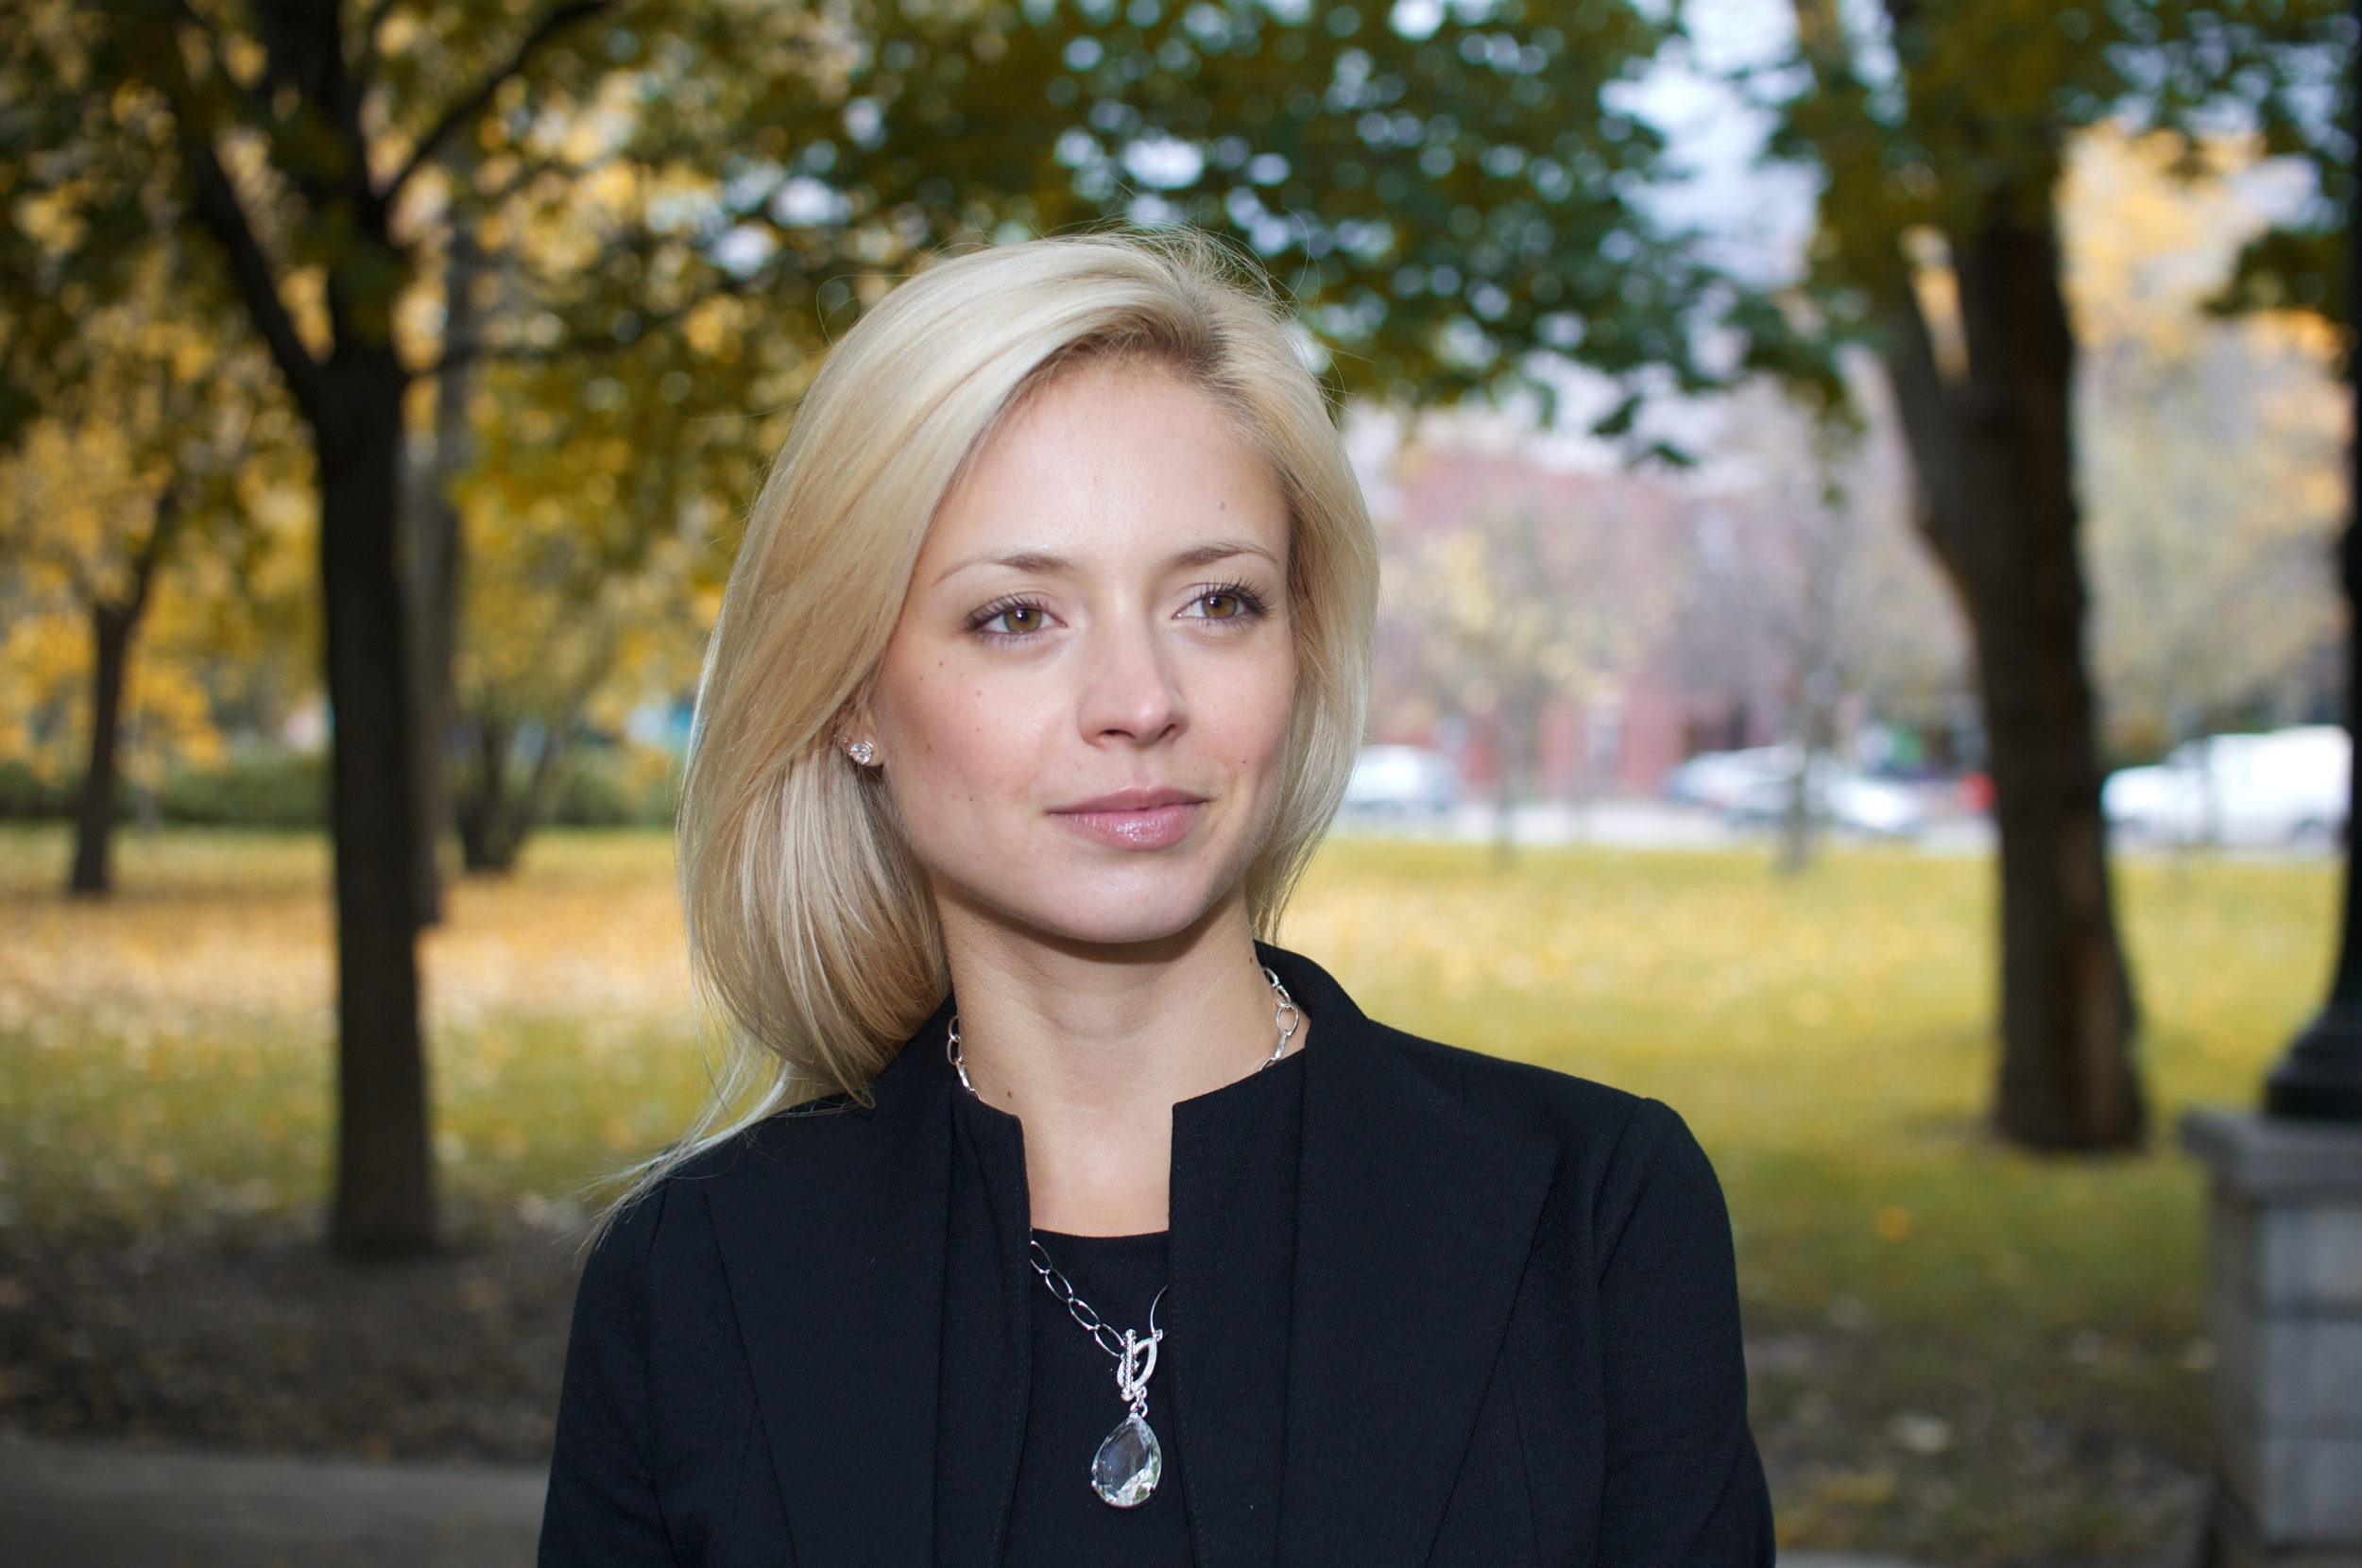 Julienne Glorieux, B.Arch, MBA, PMP, violoniste & co-fondatrice